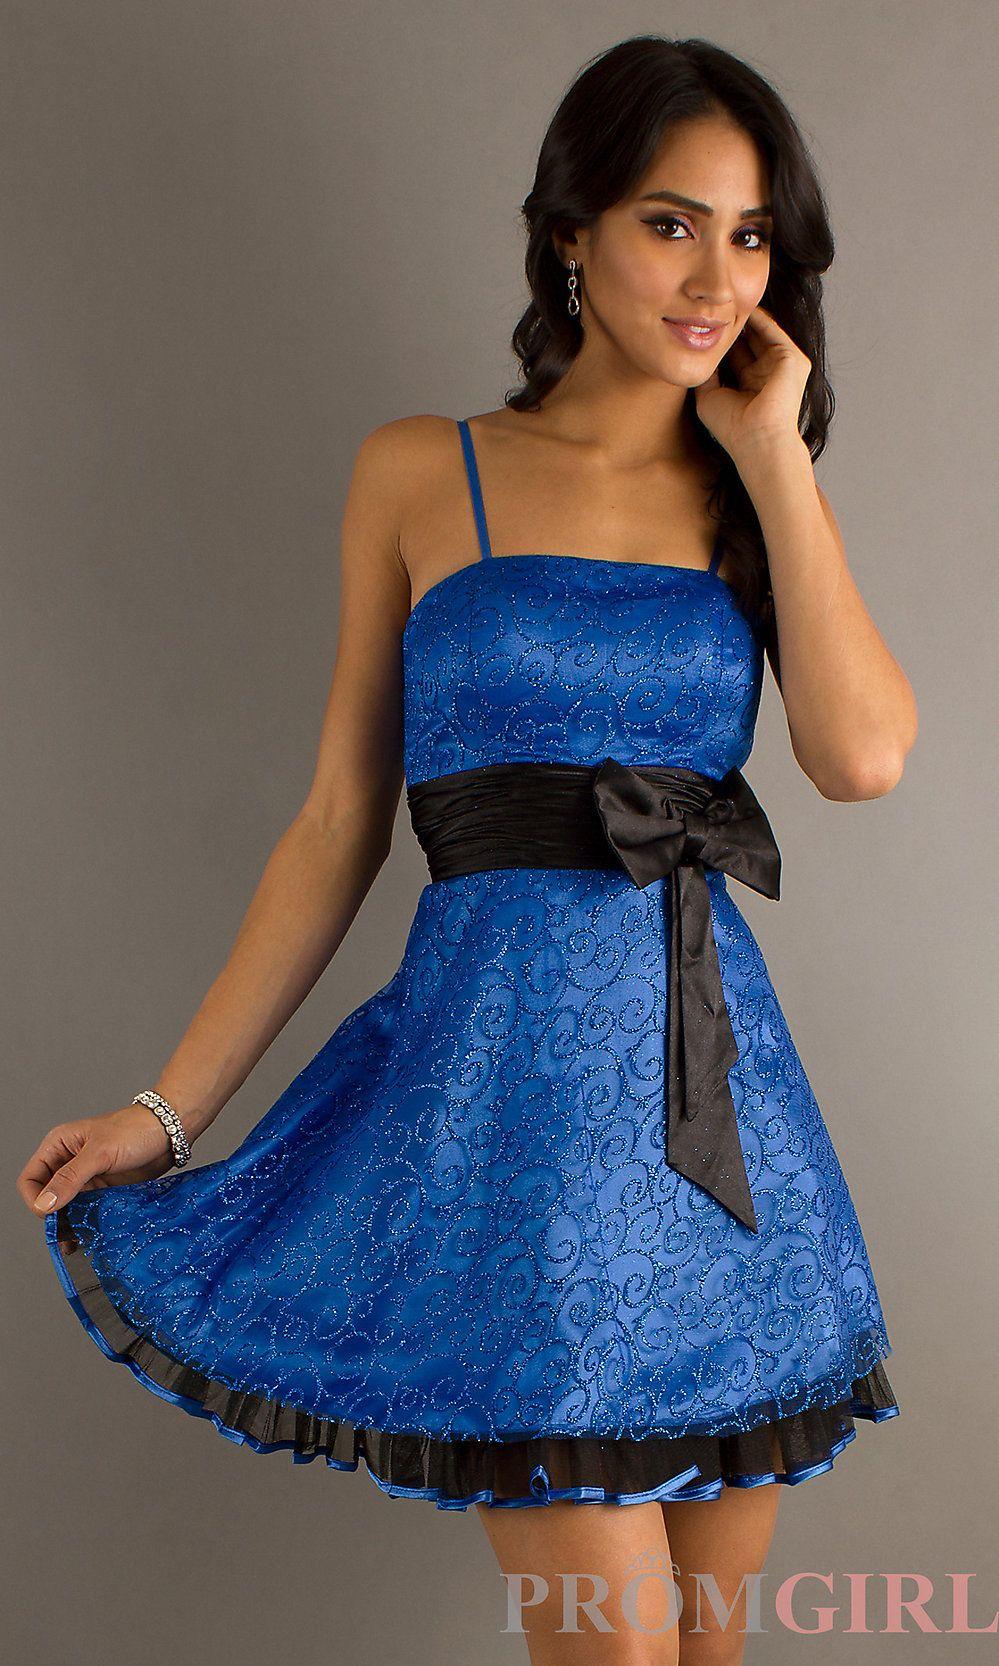 View Dress Detail: DQ-8183 | Dakota homecoming/ prom | Pinterest ...